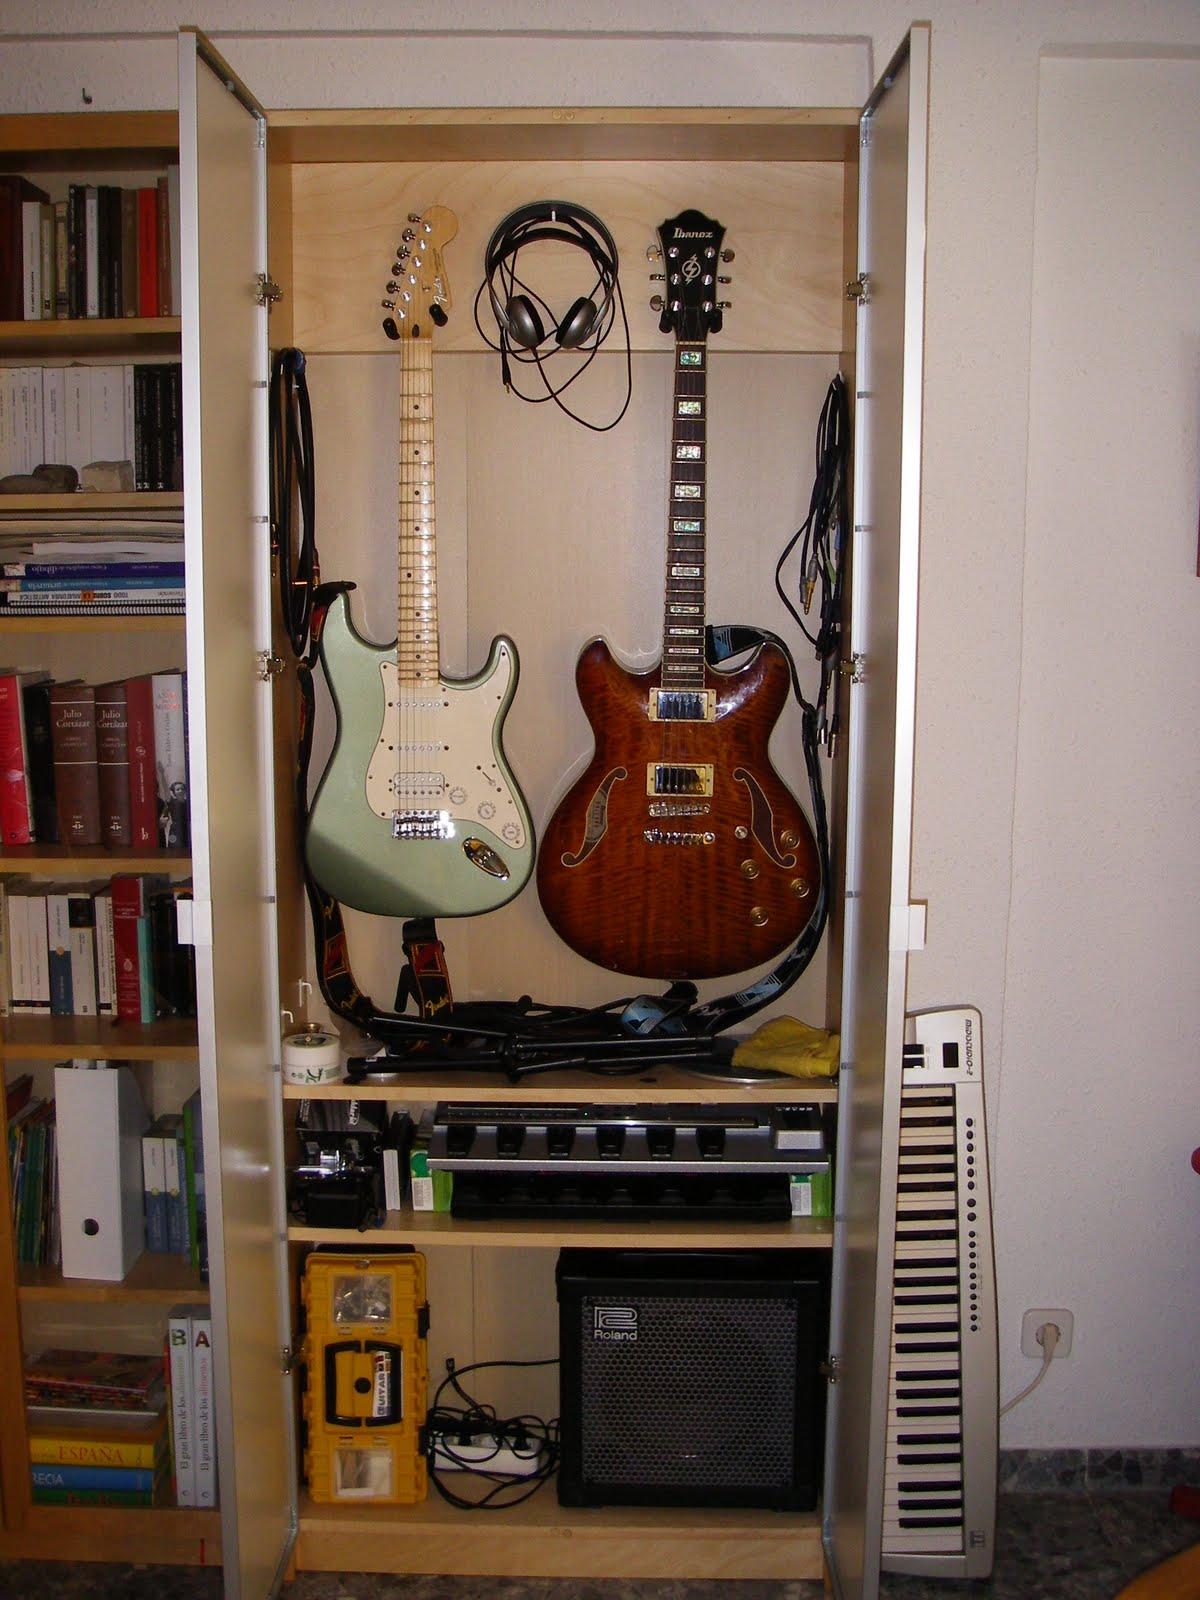 Guitarras a salvo mi llave allen for Mueble guitarras